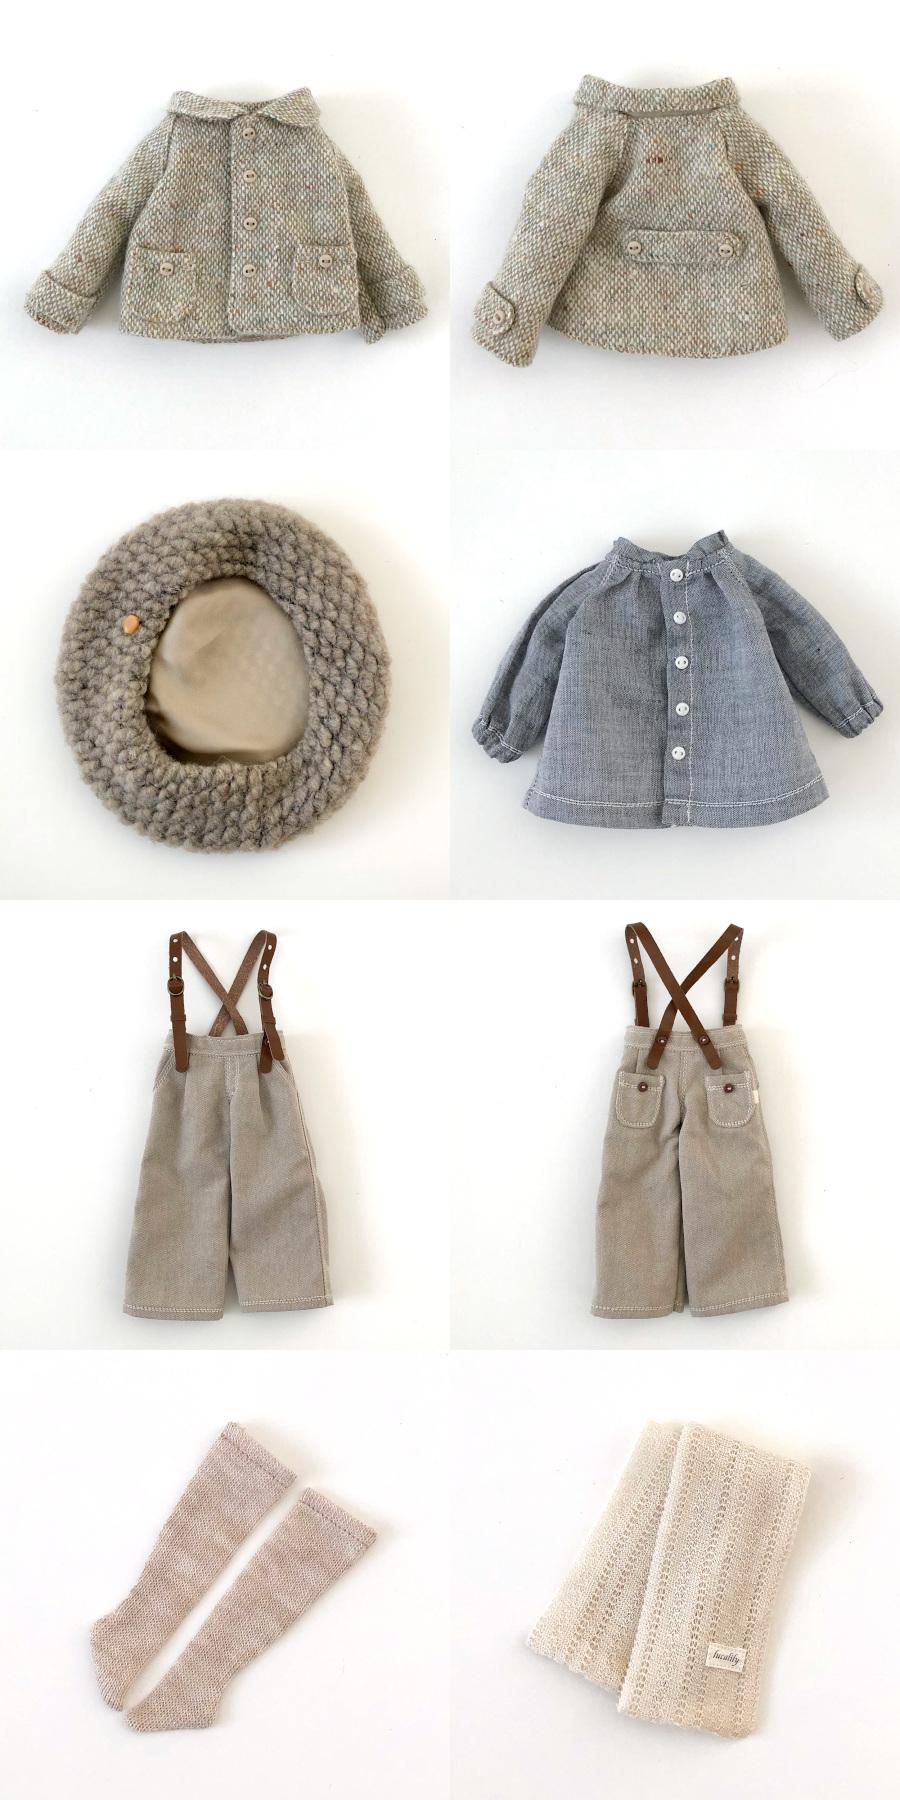 *lucalily * dolls clothes* Tweed short jacket set*_d0217189_11160912.jpg